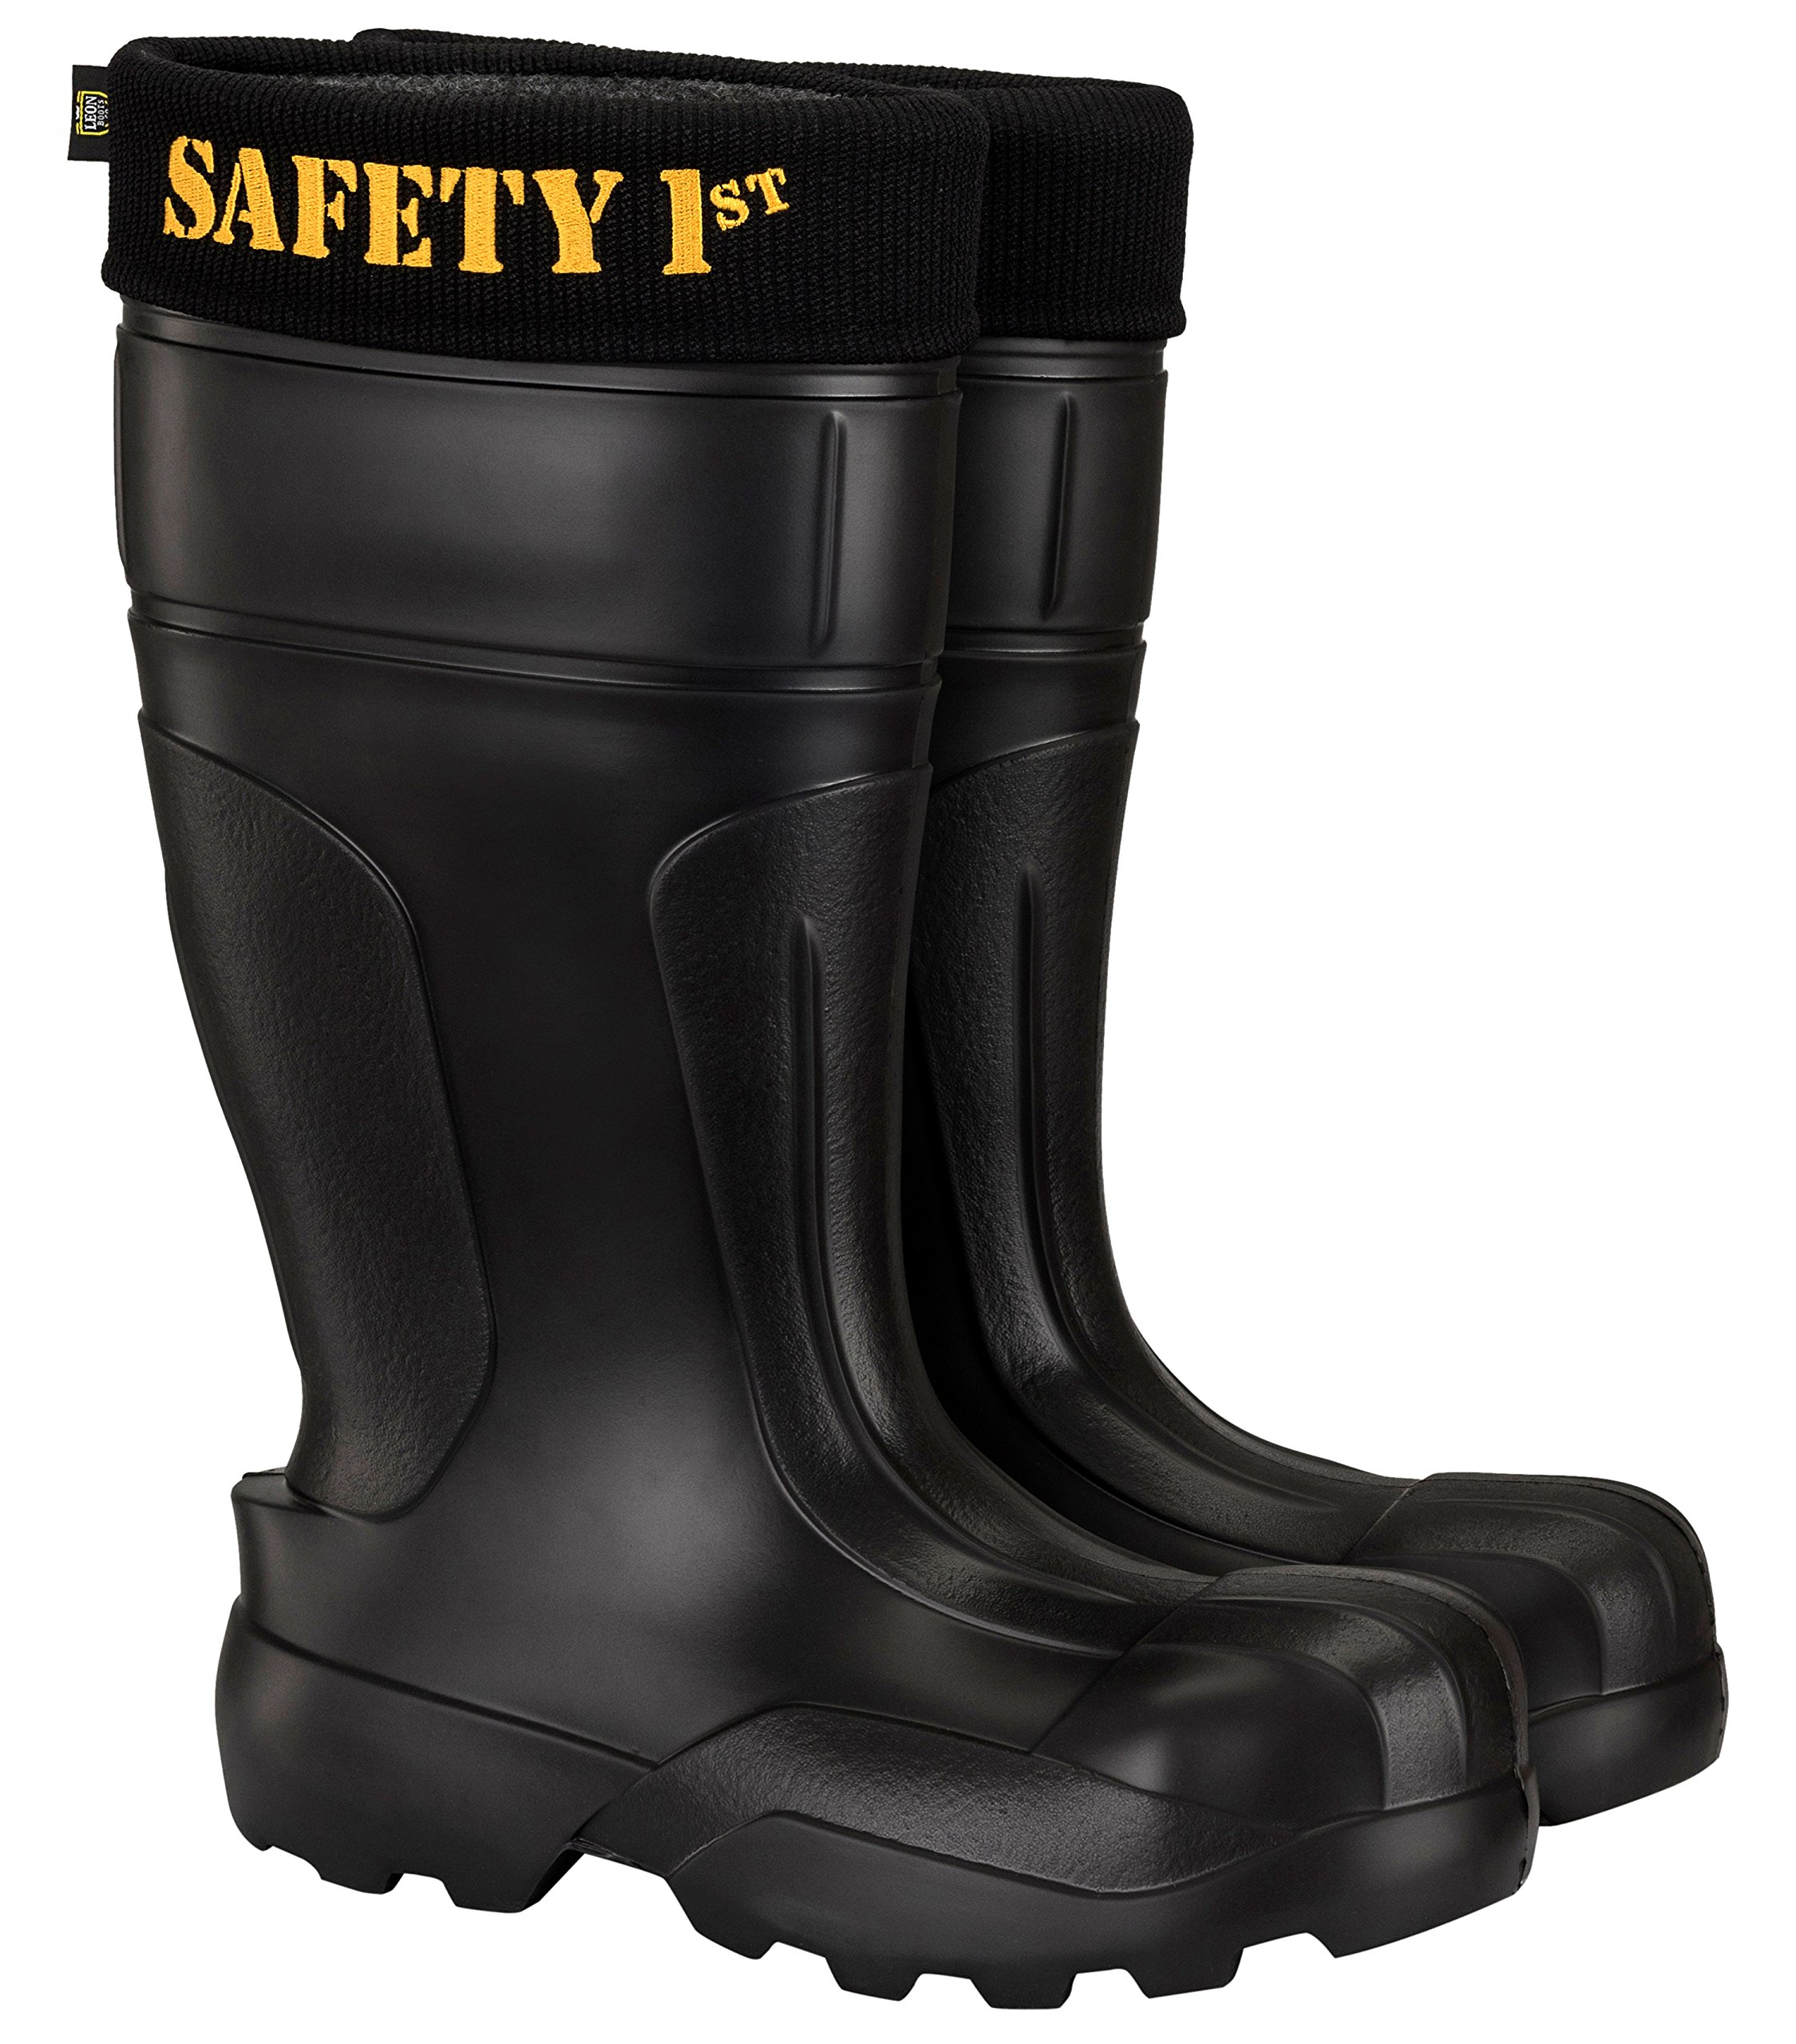 Leon Boots Co. Ultralight Men's Safety 1st EVA Non-Slip Boots, Size US 11-11-1/2, EU 45, Black